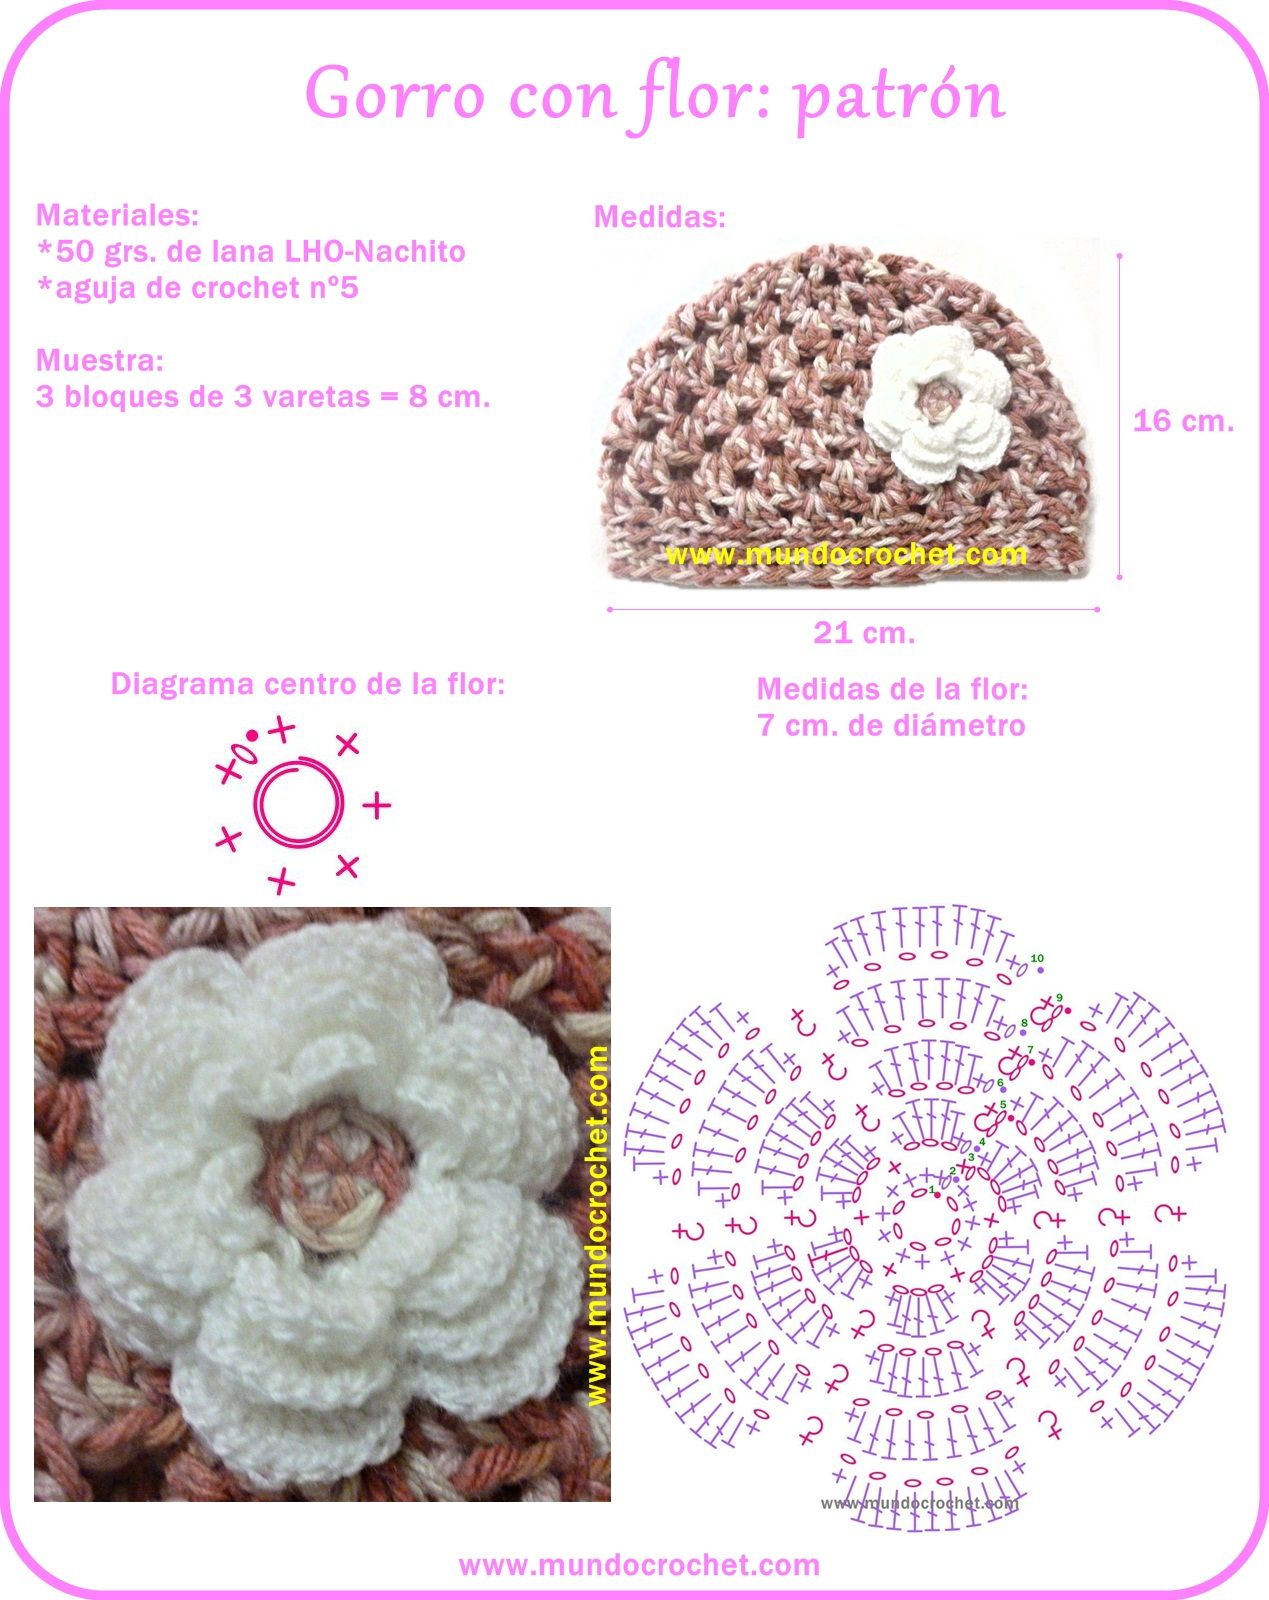 Gorro crochet | Mezgimo vašeliu raštai..... | Pinterest | Gorros ...